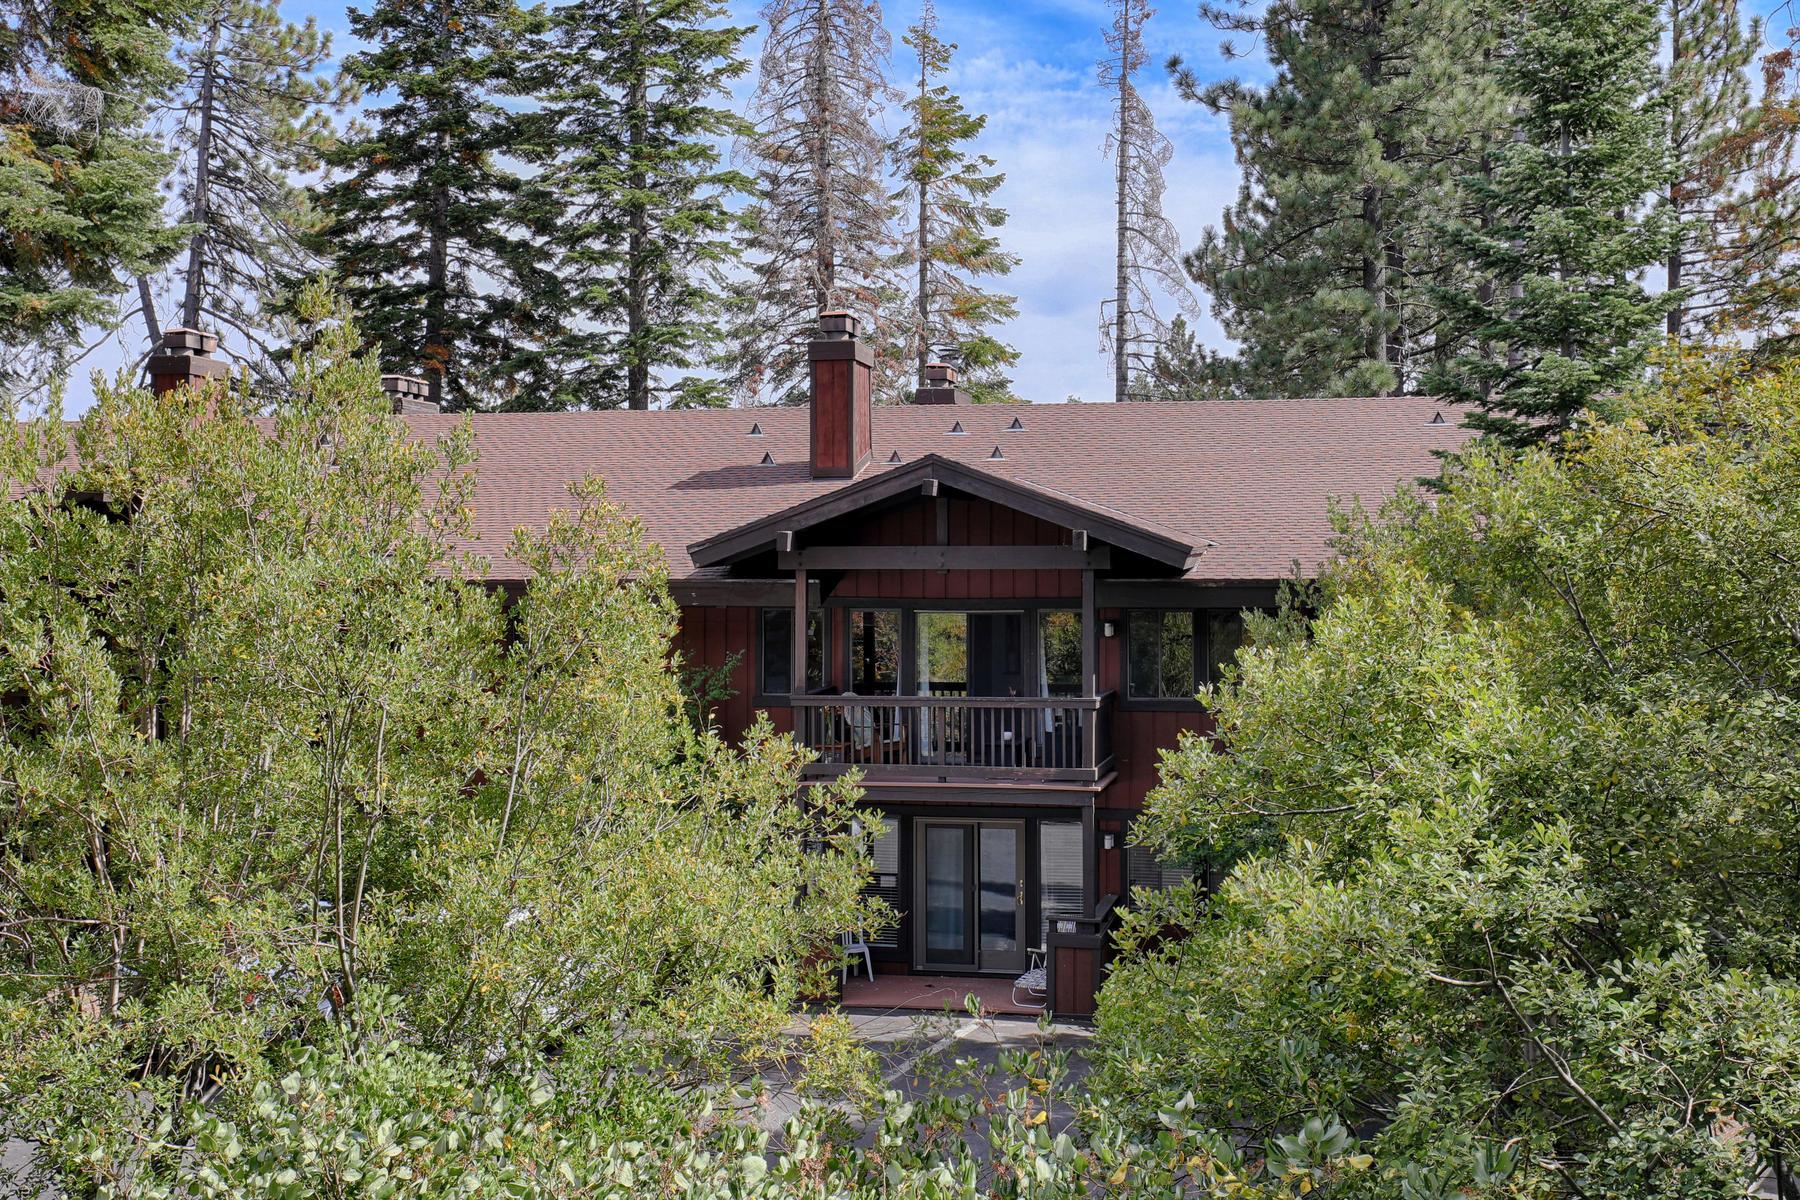 Property for Active at 725 Granlibakken Road #49, Tahoe City, CA 96145 725 Granlibakken Road #49 Tahoe City, California 96145 United States